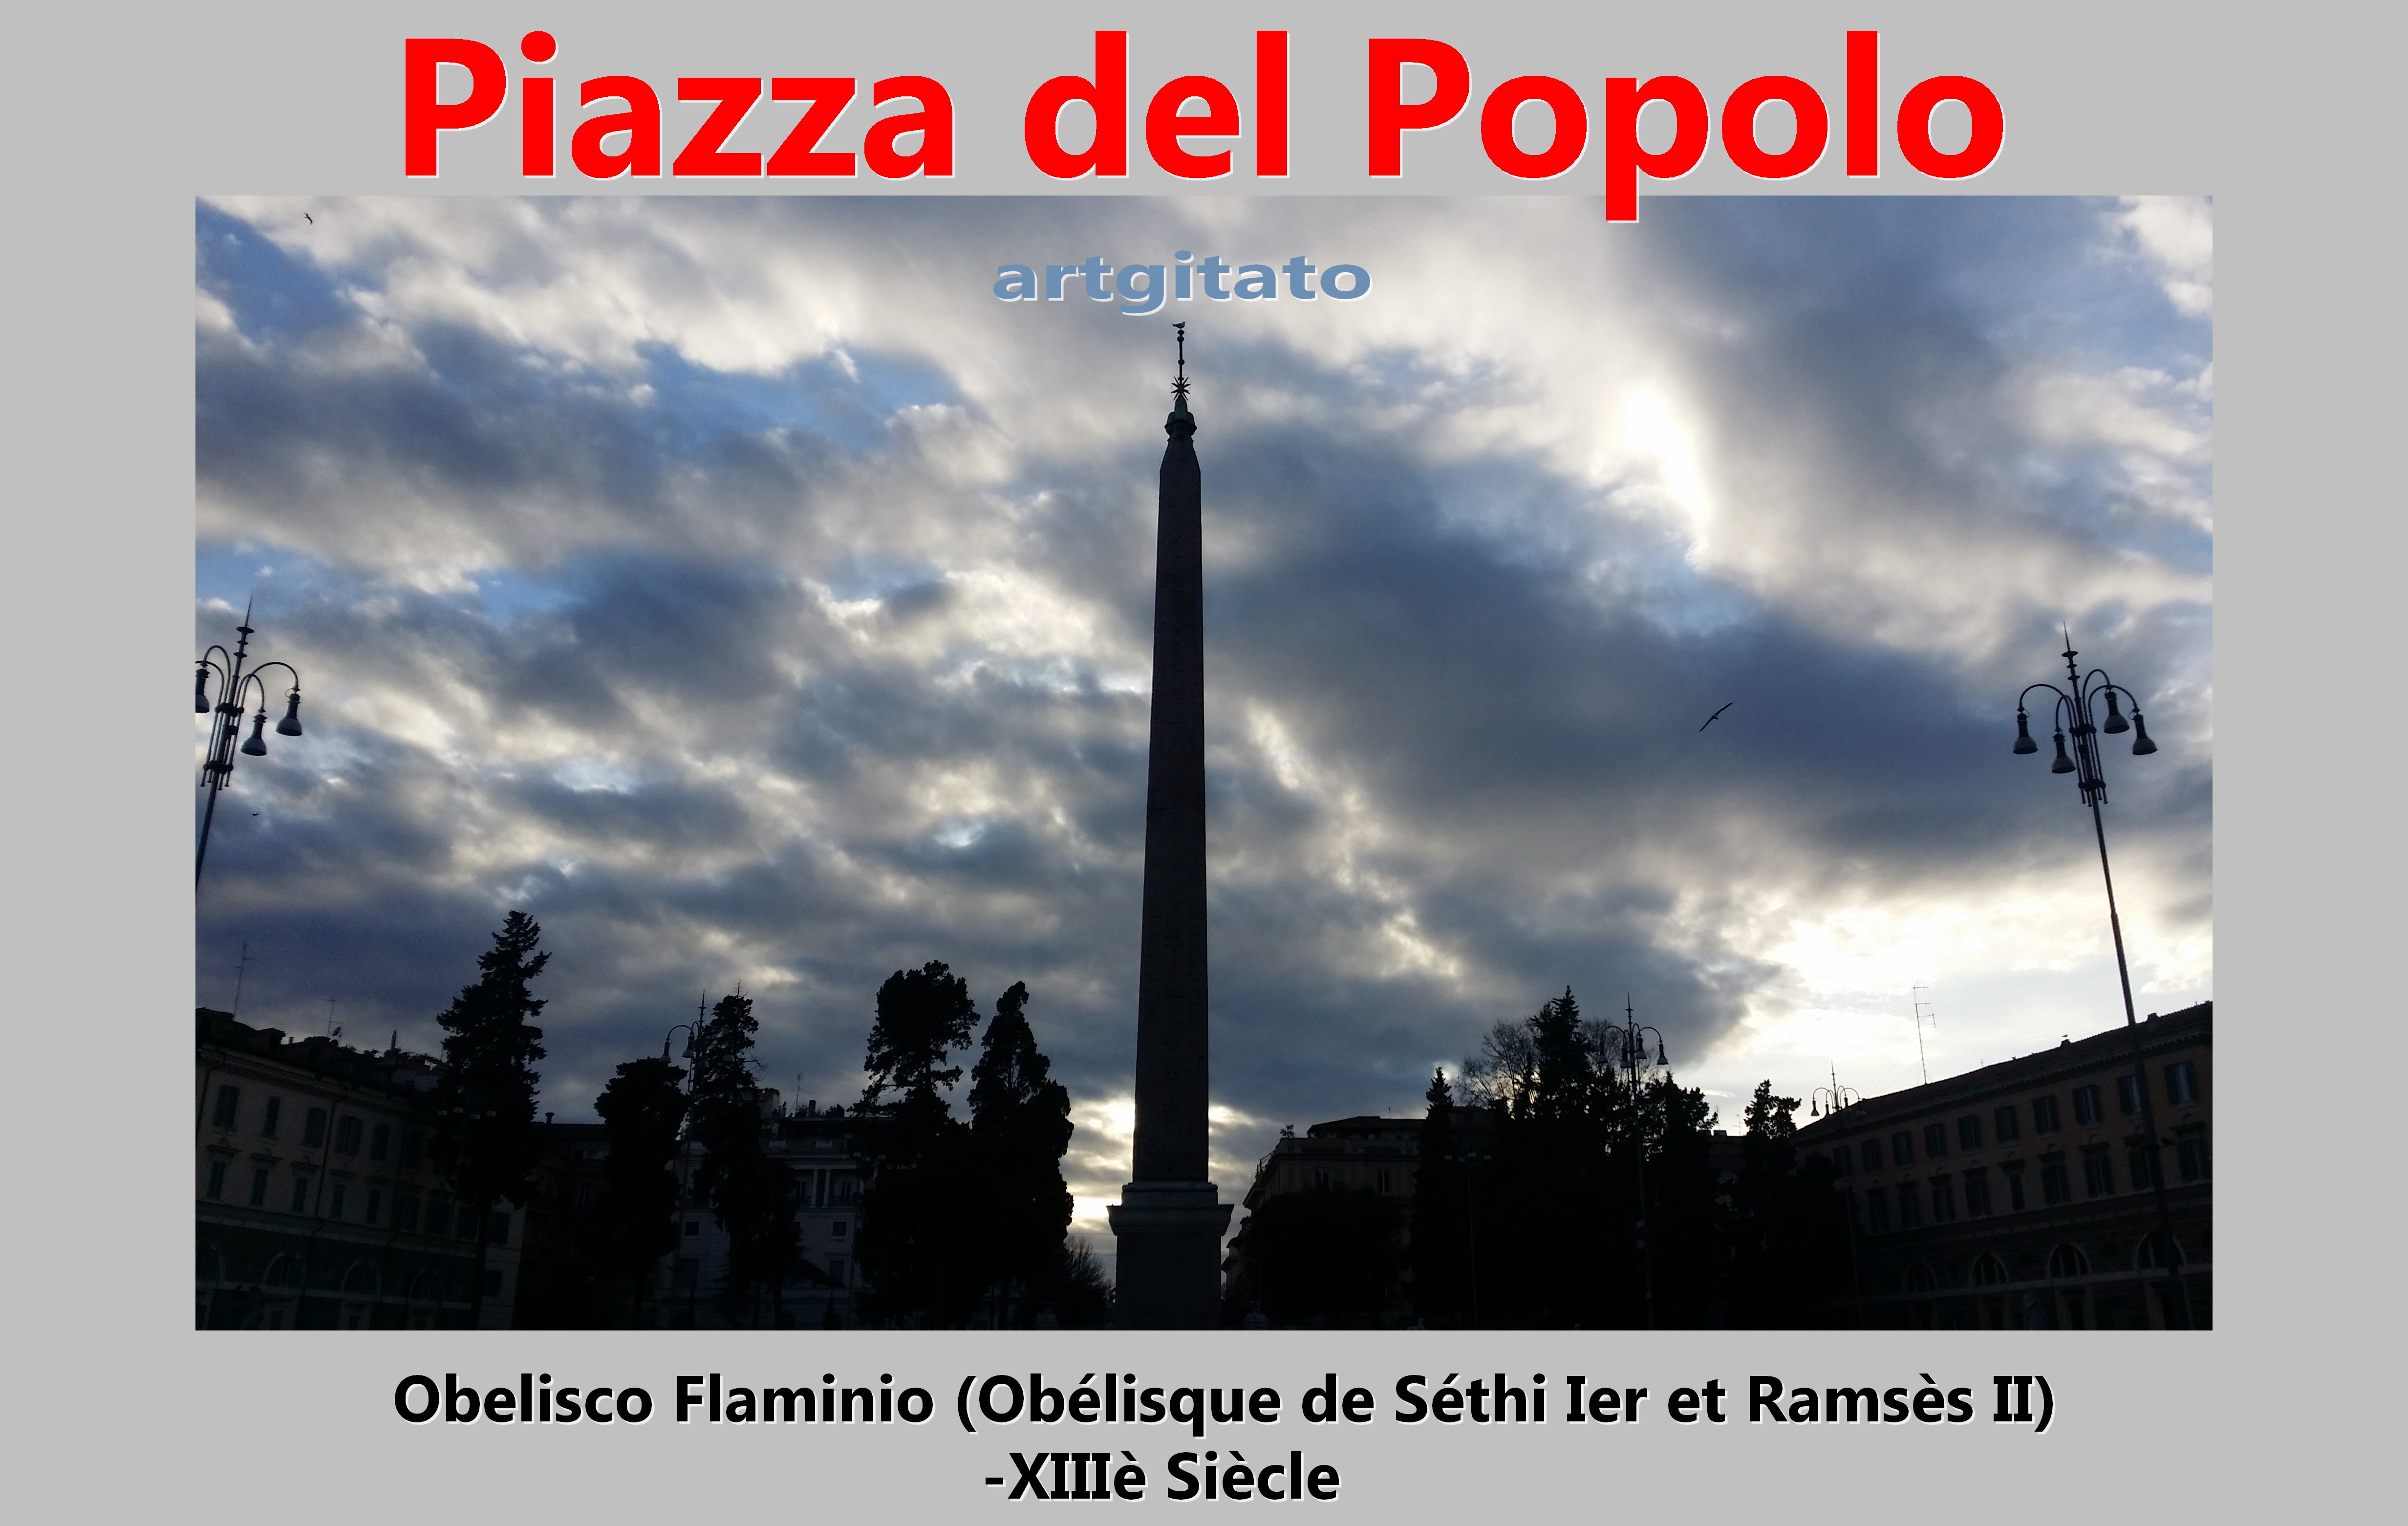 Piazza del popolo 4 Obelisco Flaminio Obélique Séthi Ier et Ramsès II